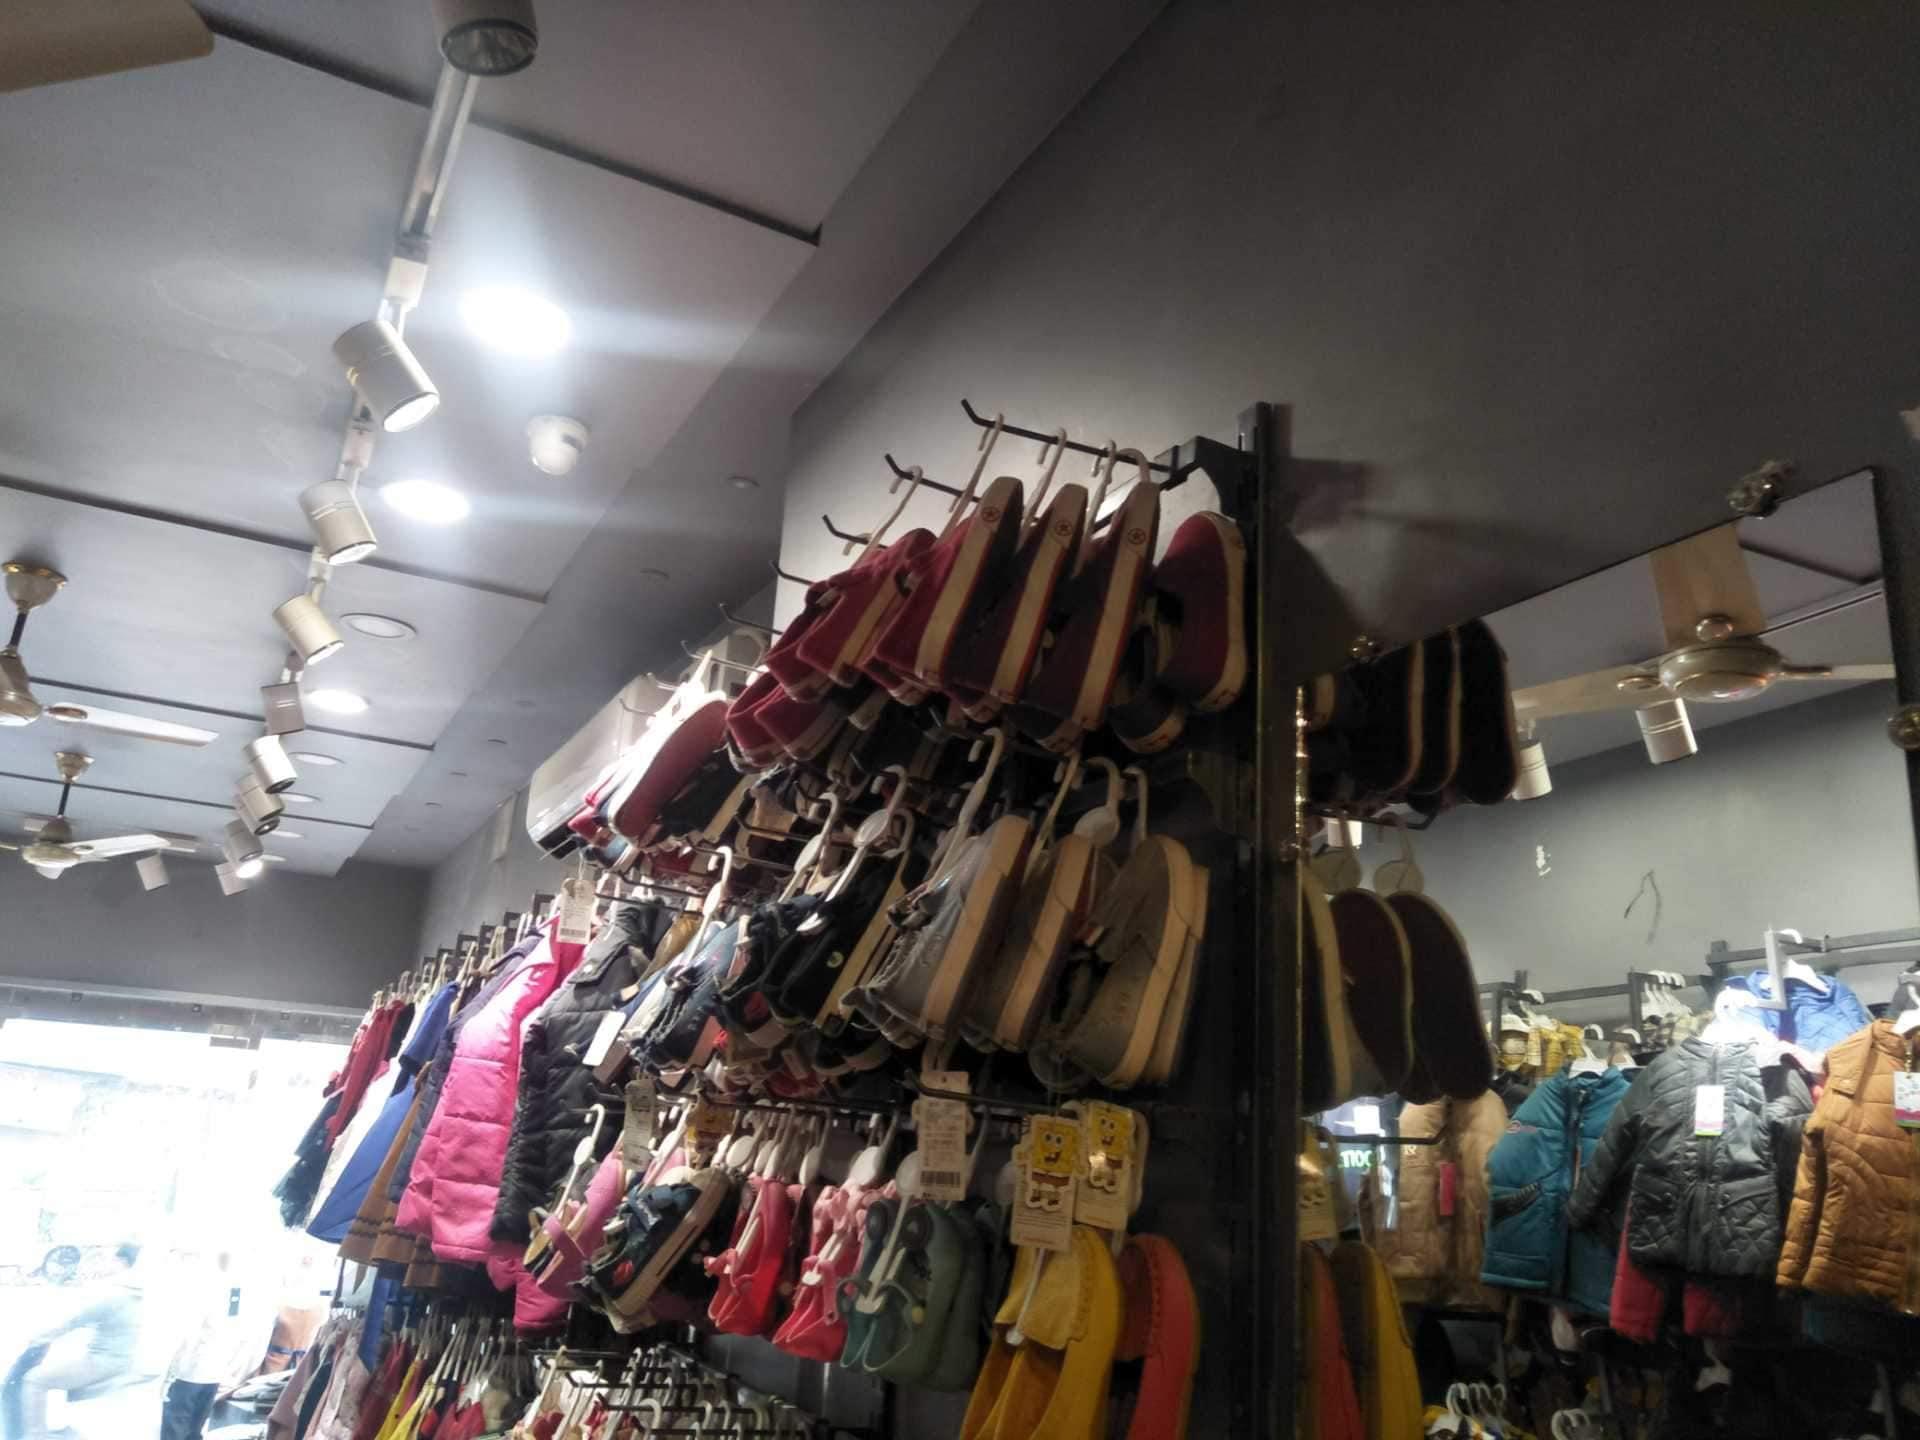 e3ba4da35e Top 100 Gents Readymade Garment Retailers in Varanasi - Best ...